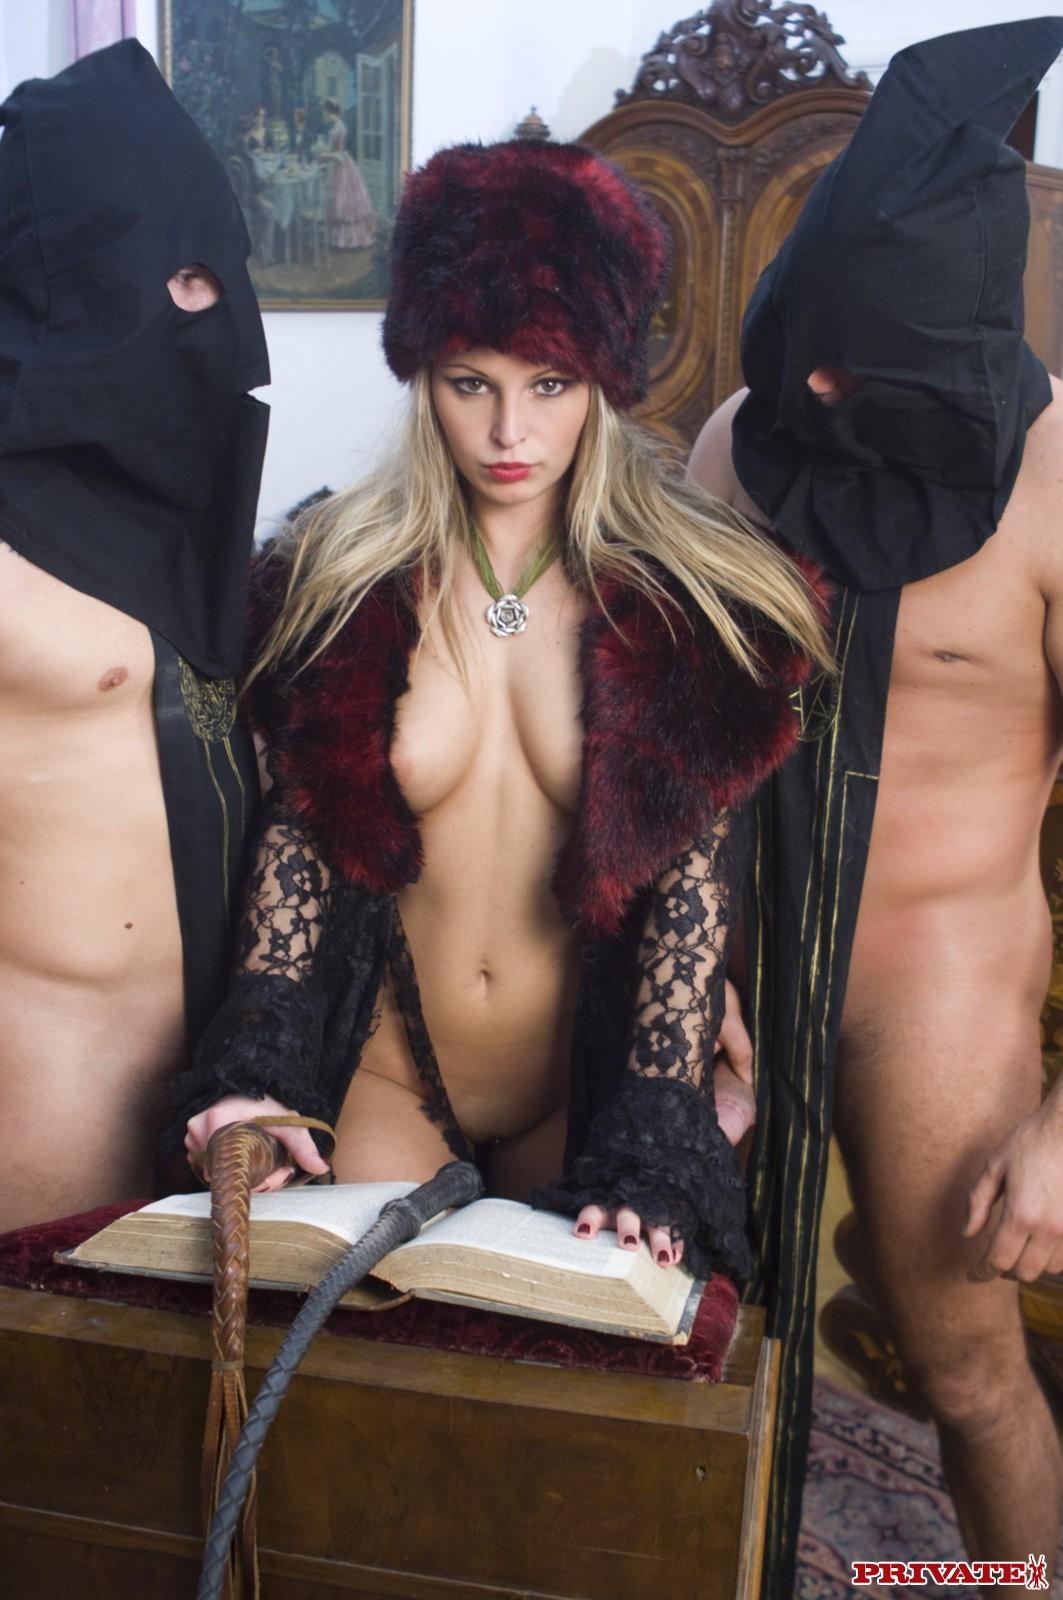 Drakula fucking blood pics hentai tube